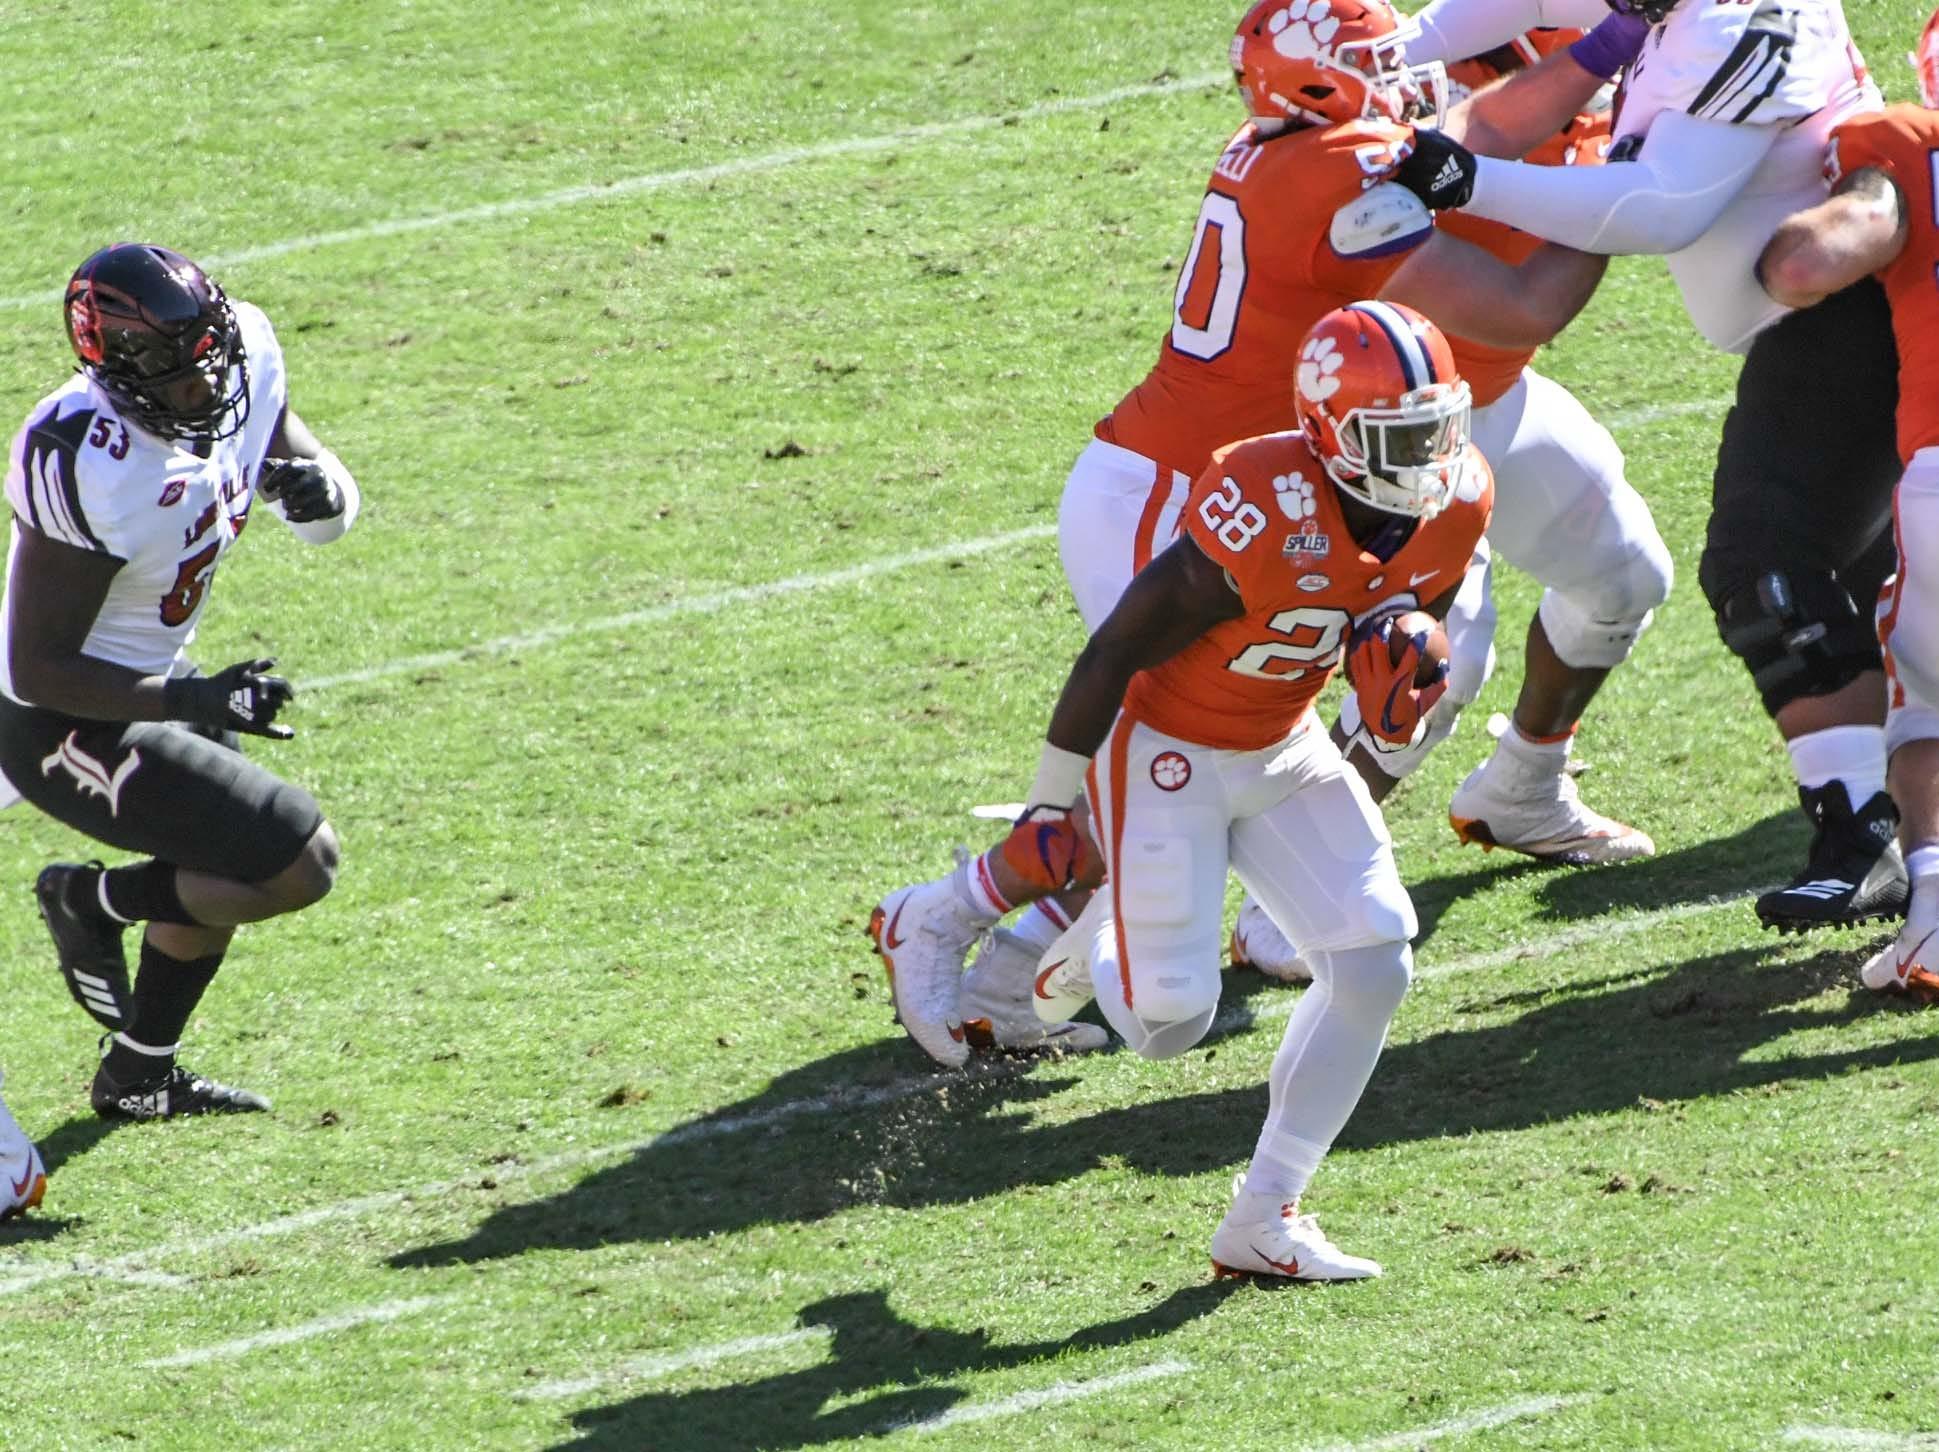 Clemson running back Tavien Feaster (28) runs for a 70-yard touchdown during the first quarter in Memorial Stadium on Saturday, November 3, 2018.